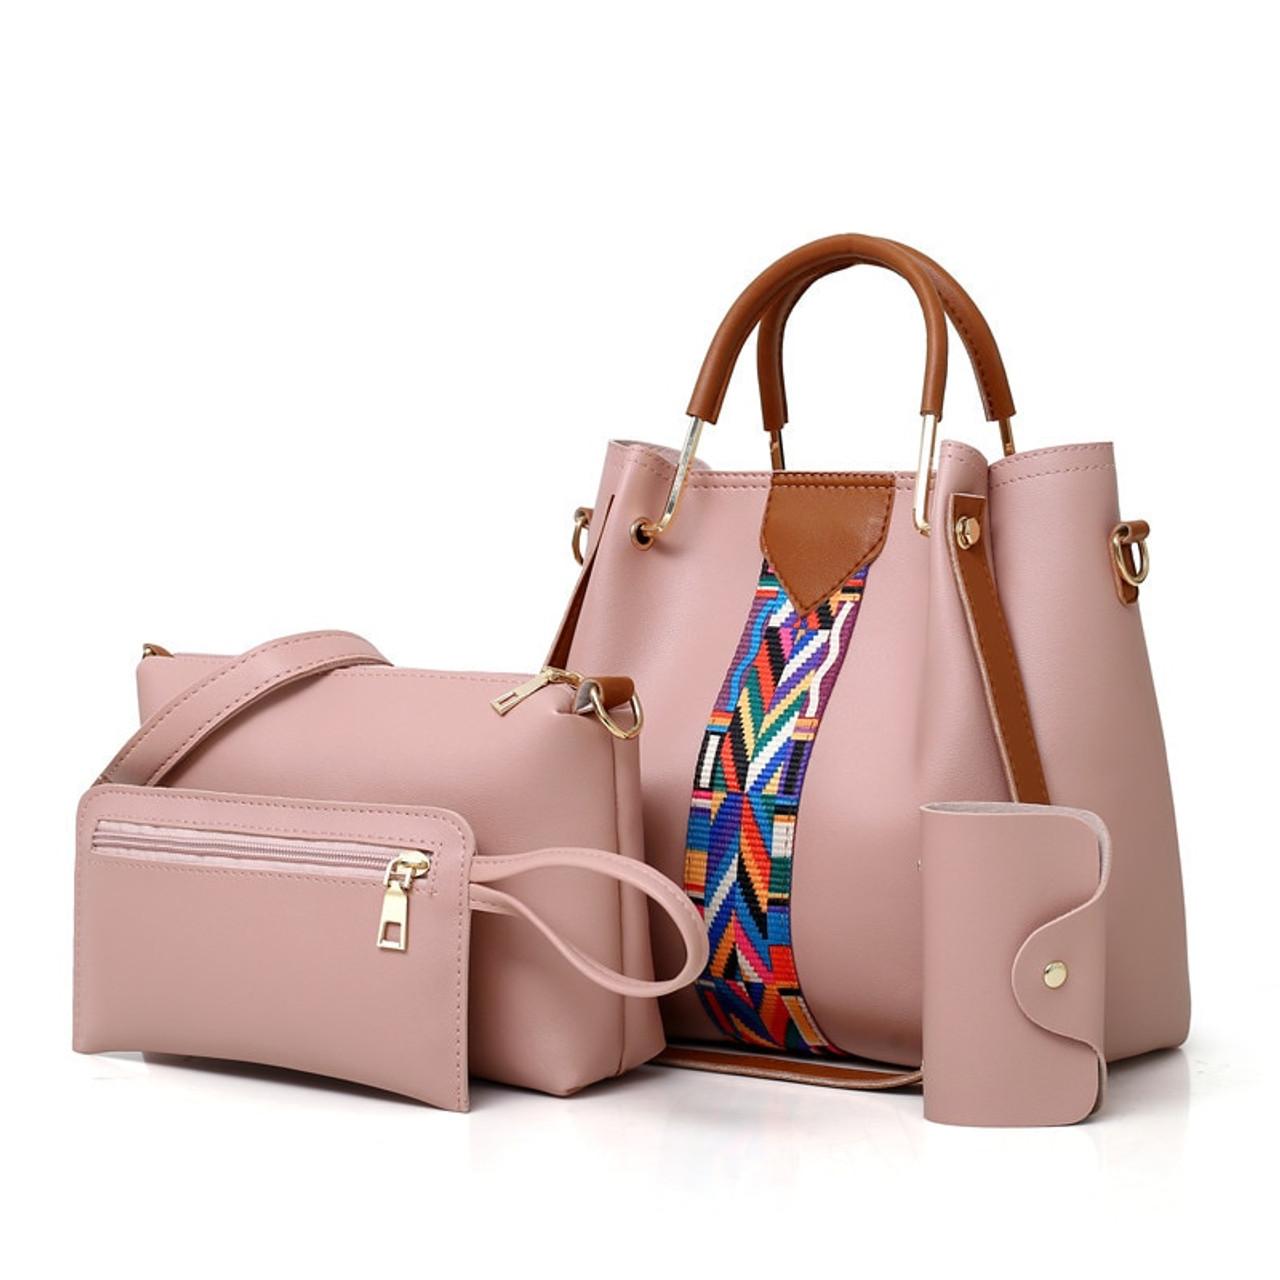 1271165f5cc4 4PCS Set Purses and Handbags PU Leather Striped Shoulder Bags for Women  2018 Fashion Top-Handle Bags Female Shoulder Bag - OnshopDeals.Com